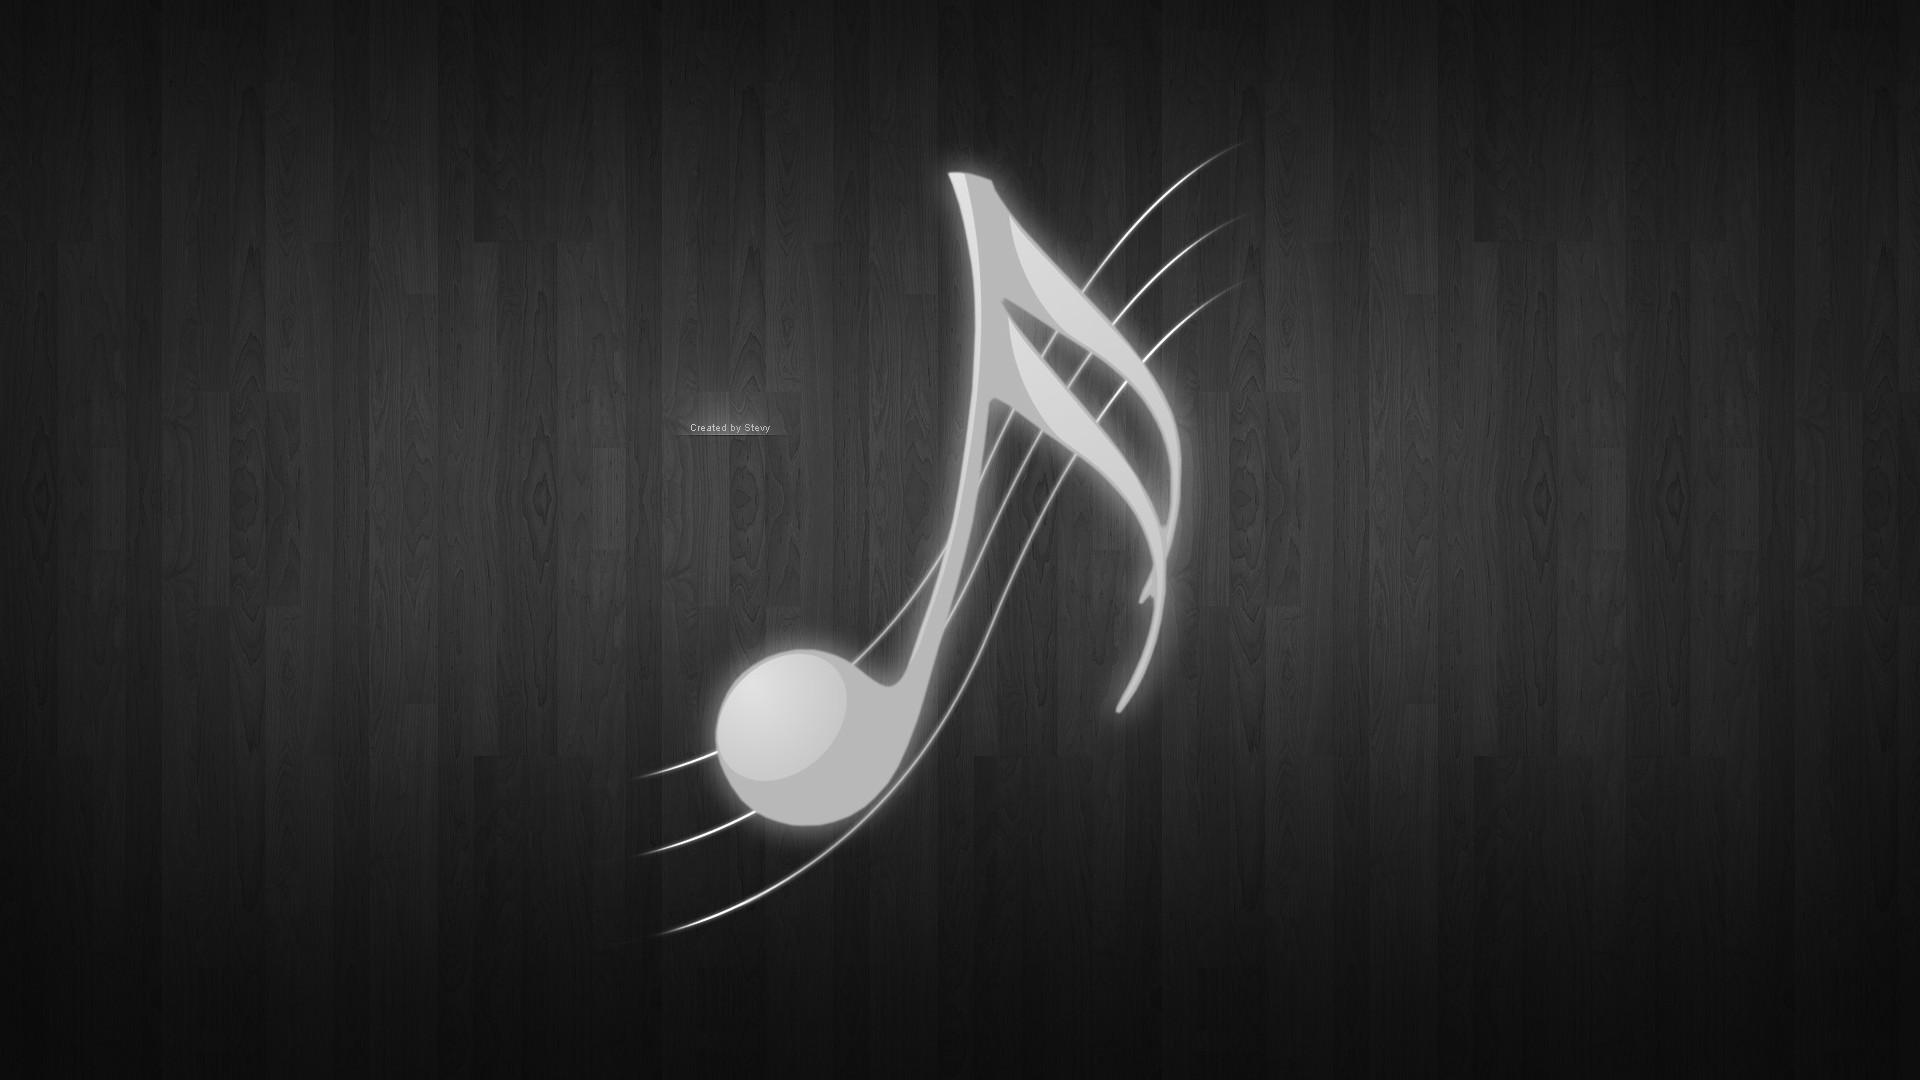 273754-music-wallpaper-1920x1080-iphone.jpg